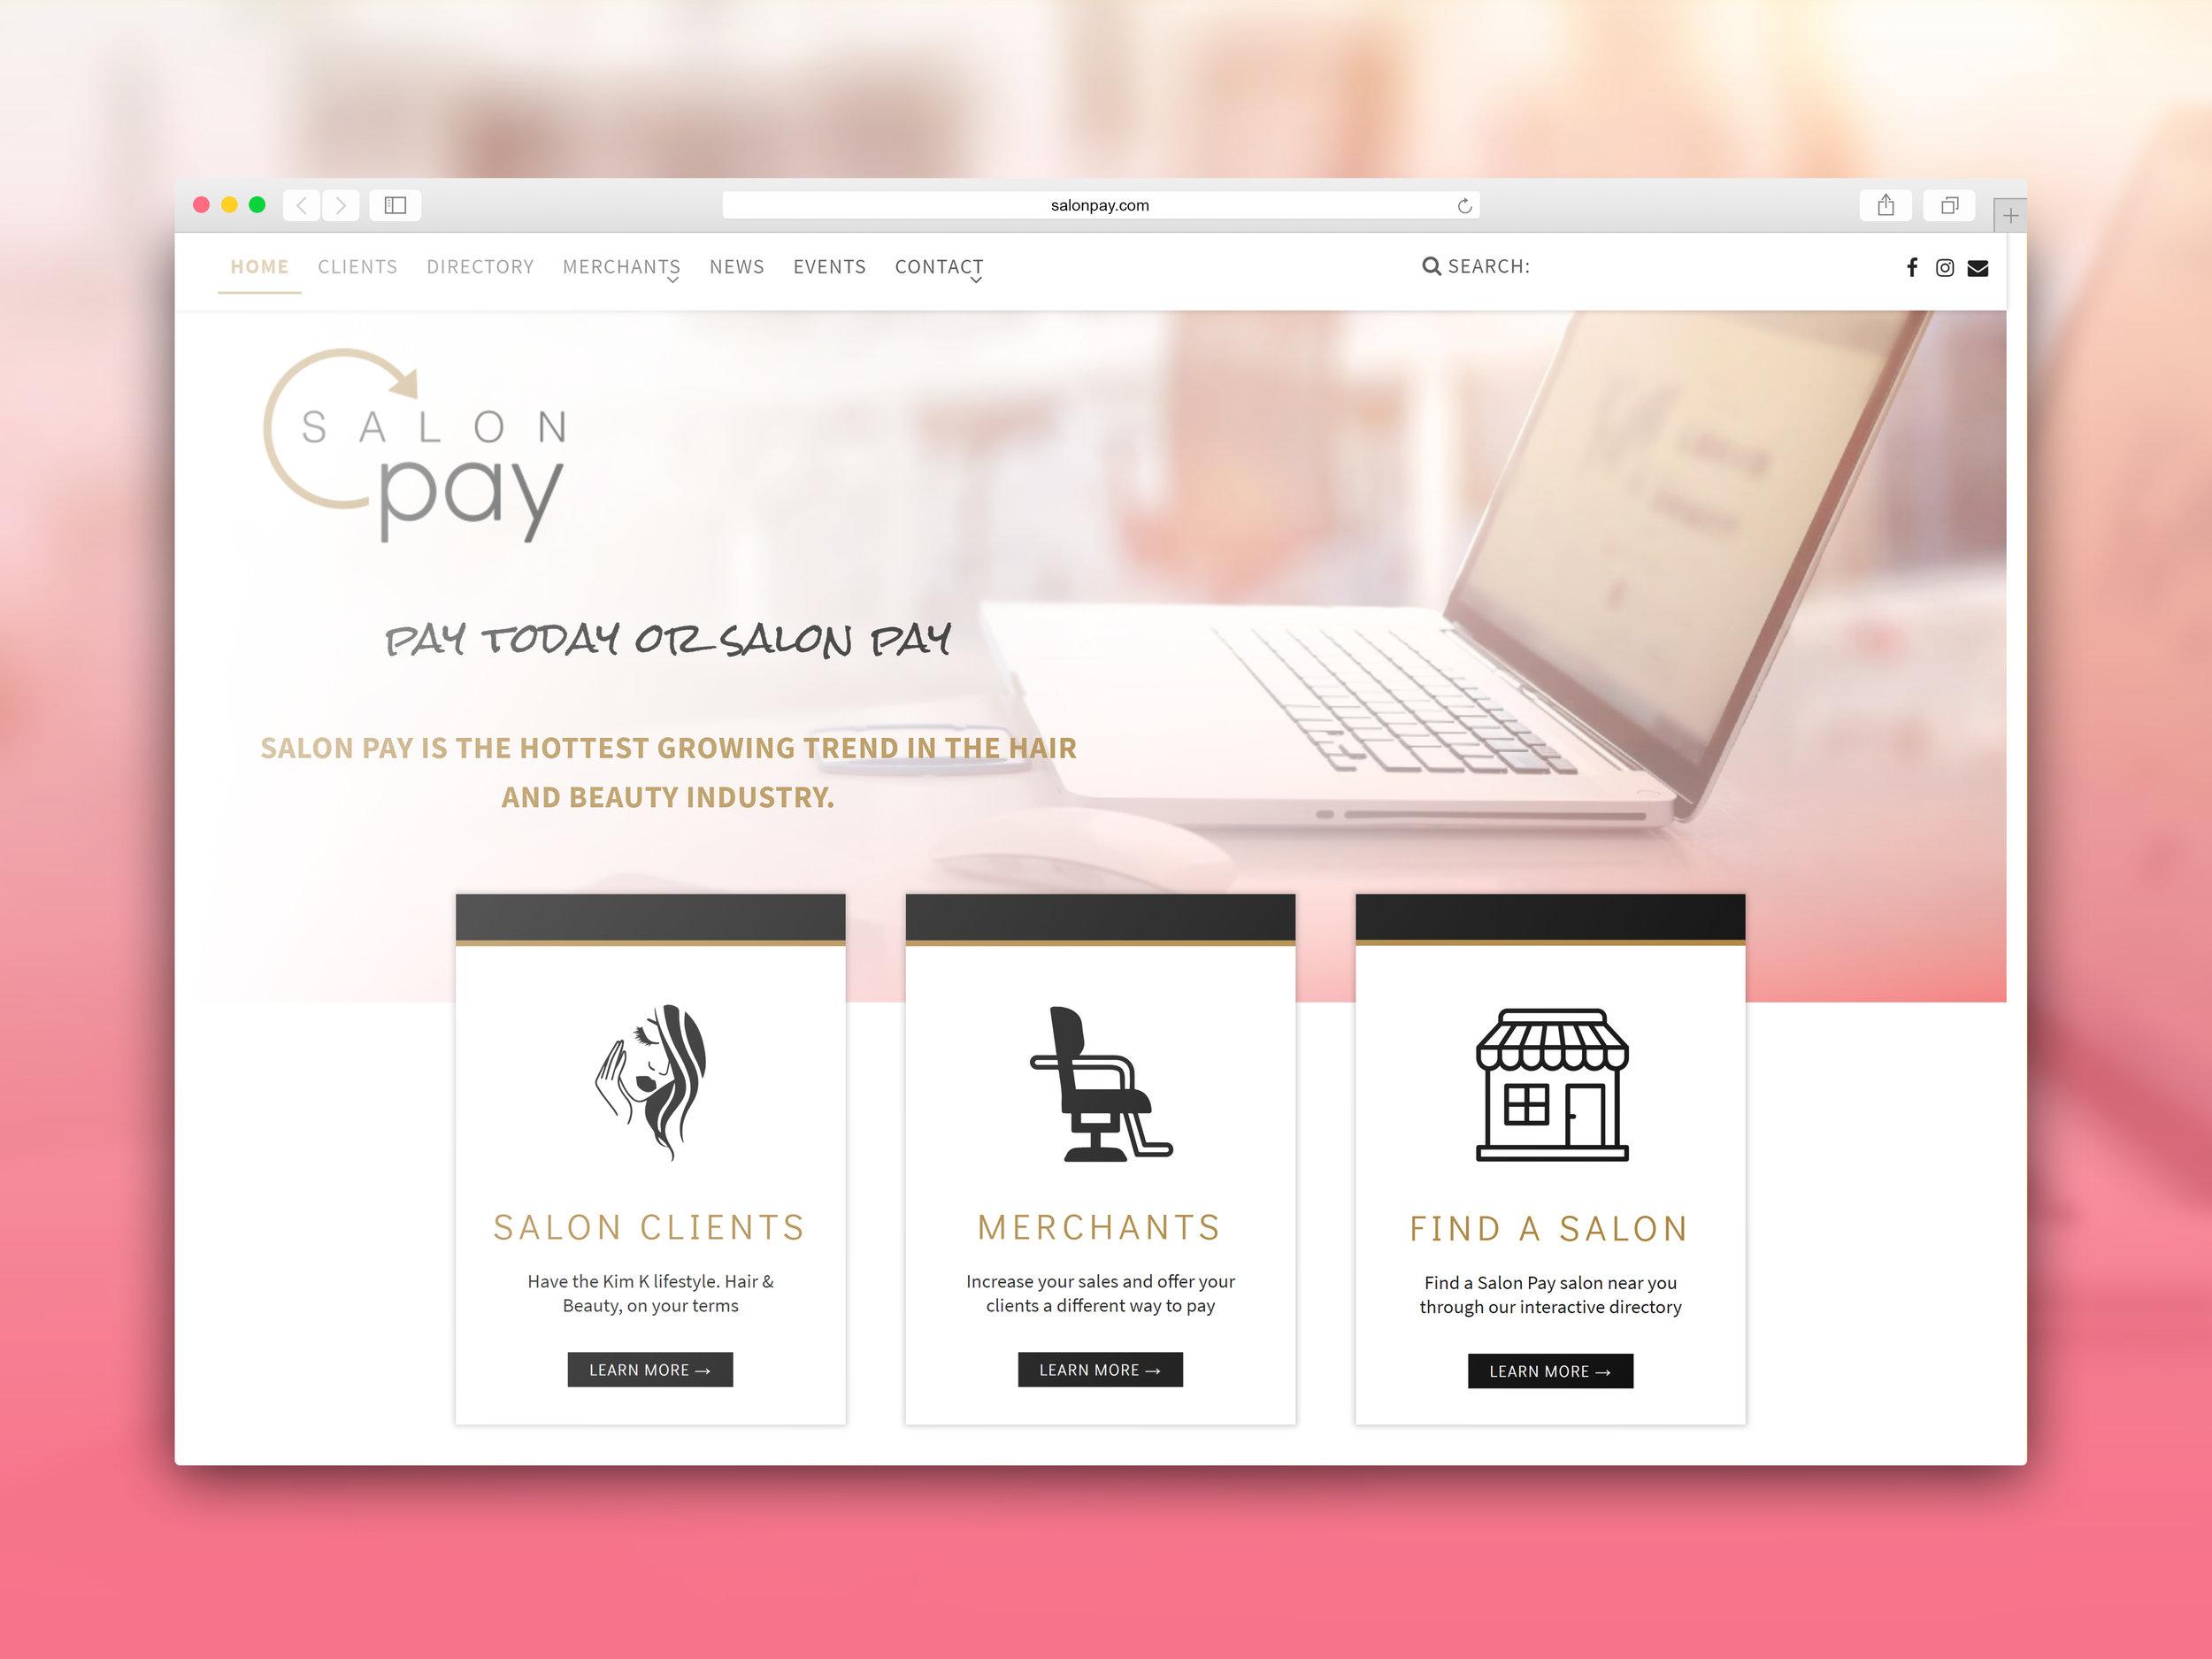 websitemockup-salonpay.jpg